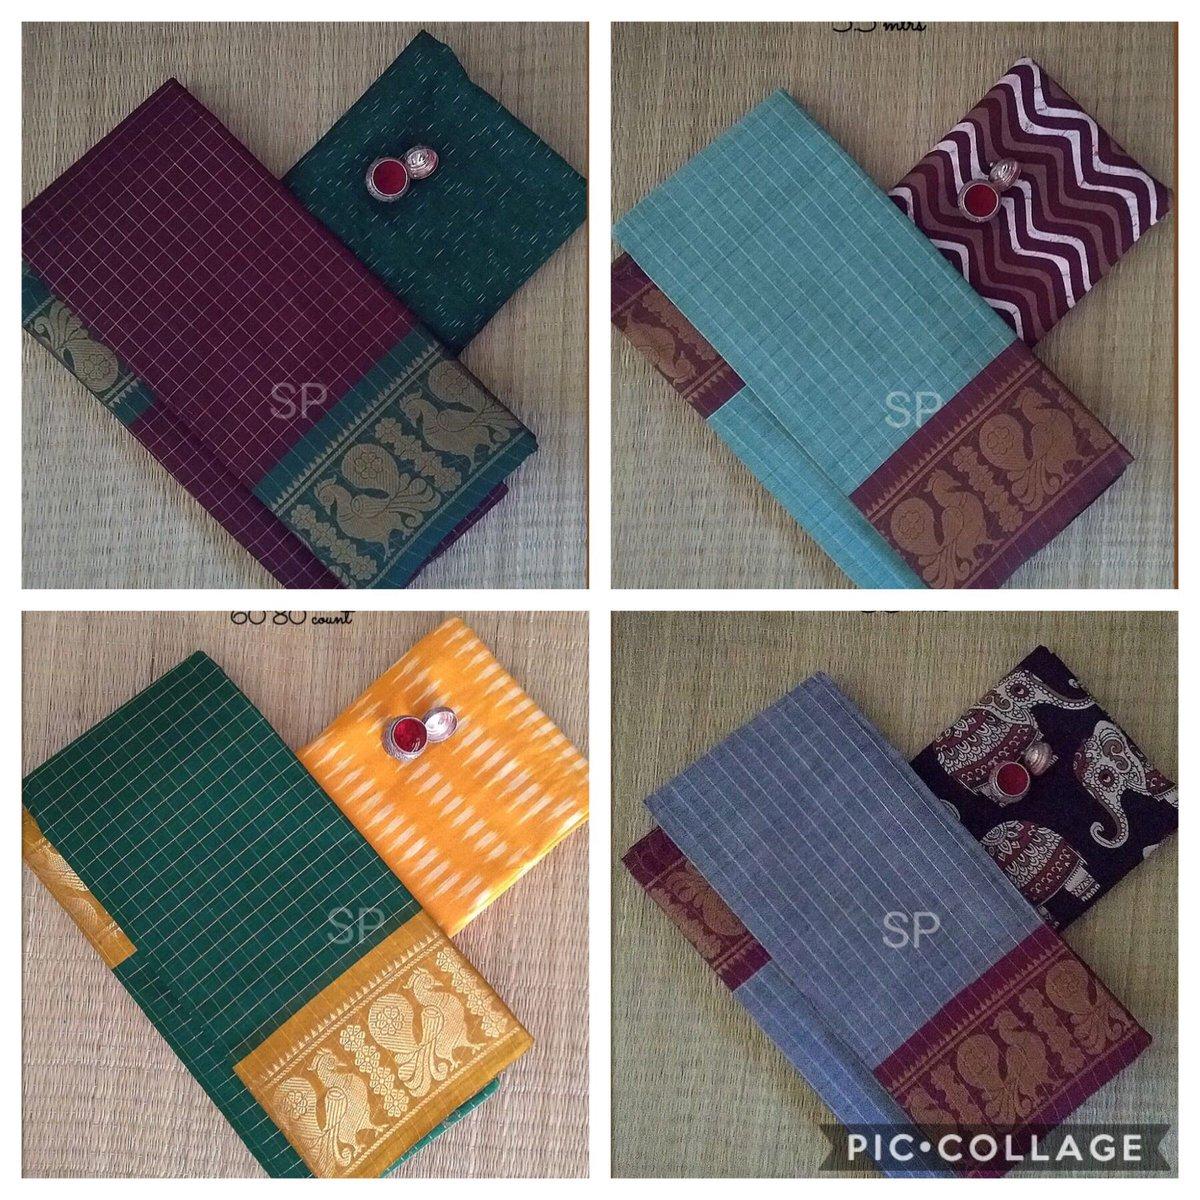 Chettinad Annam zari checked saree paired with ikkat or kalamkari blouse. Pure handloom saree